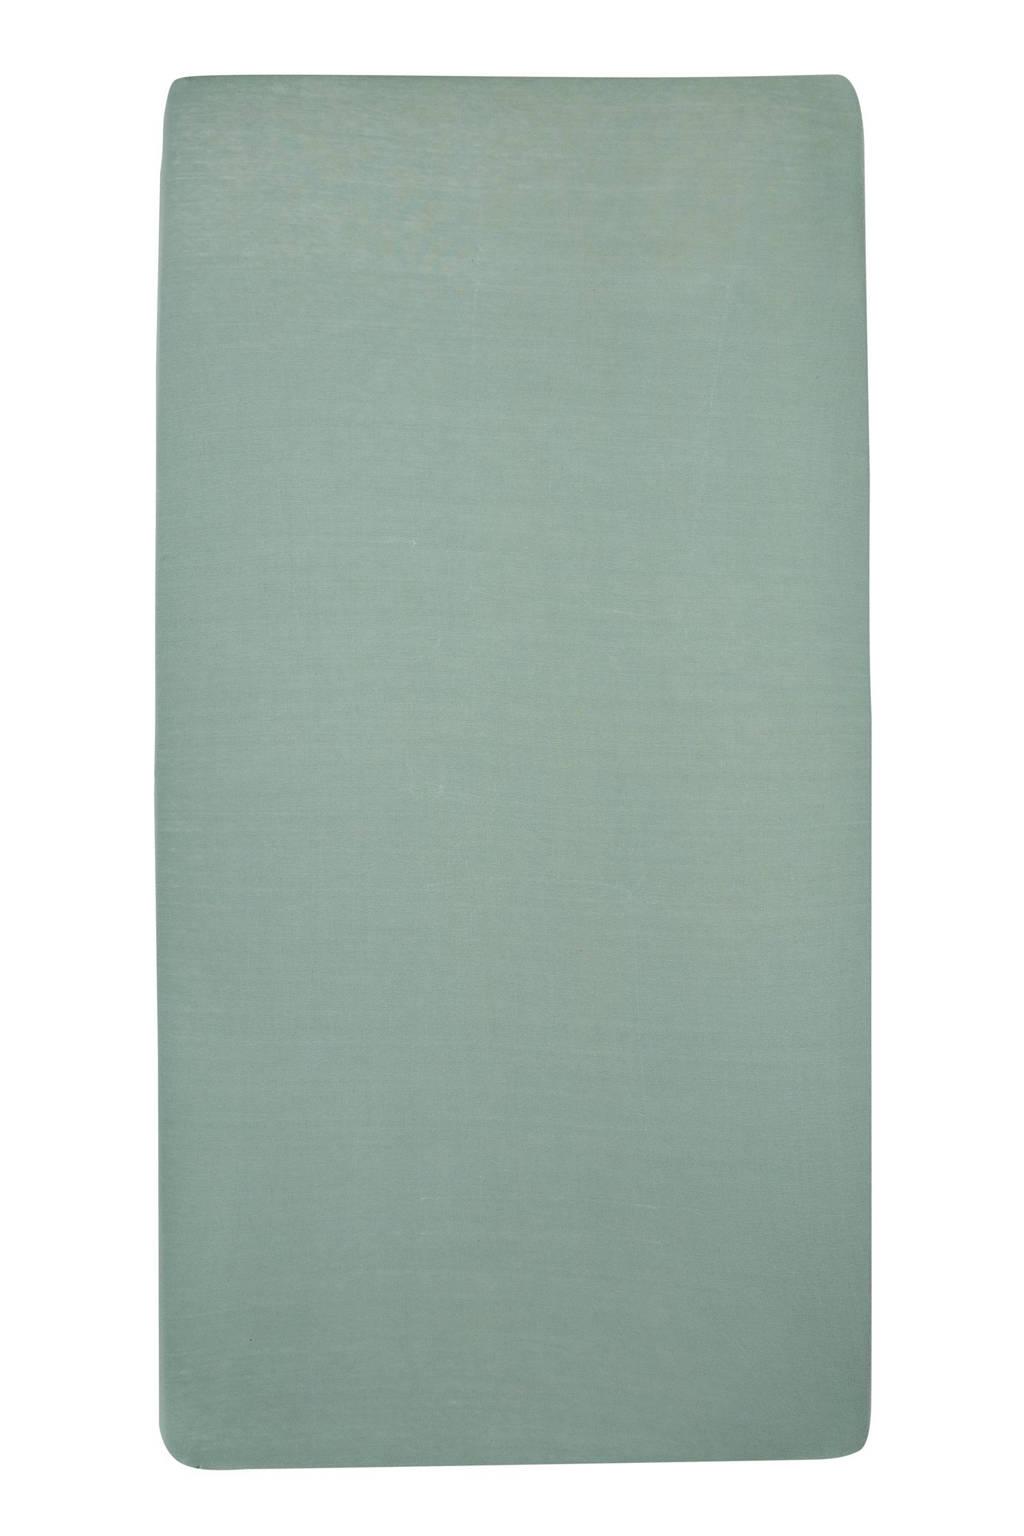 Meyco jersey hoeslaken peuterbed 70x140/150 cm Stone green, Stone Green